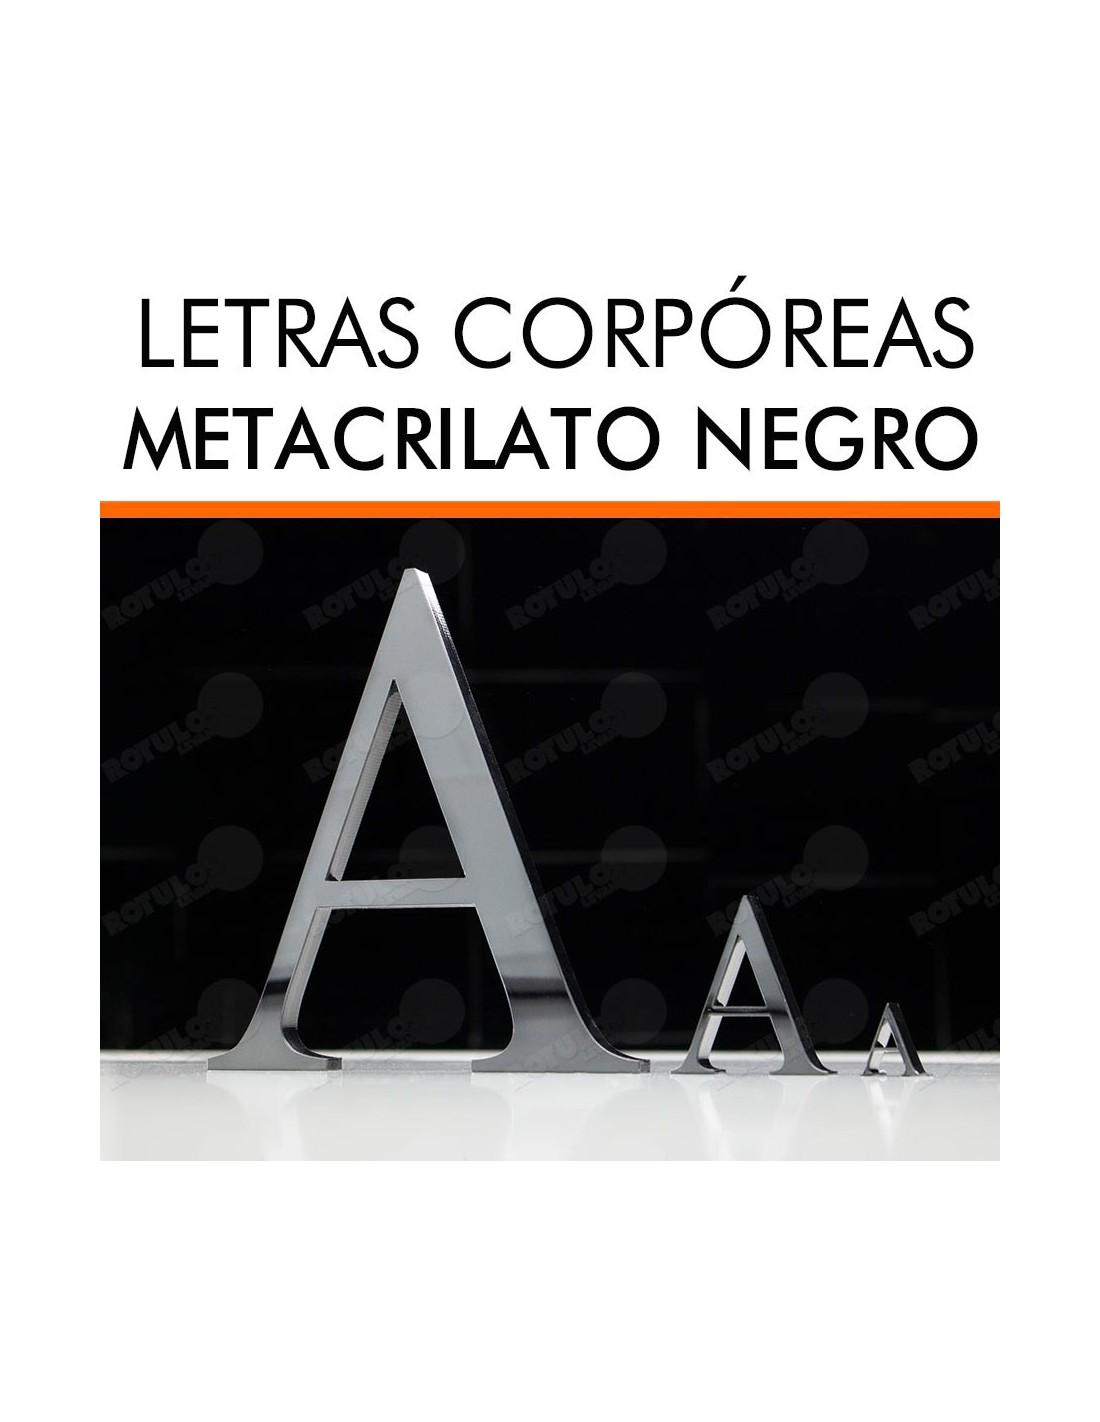 Letras metacrilato negro